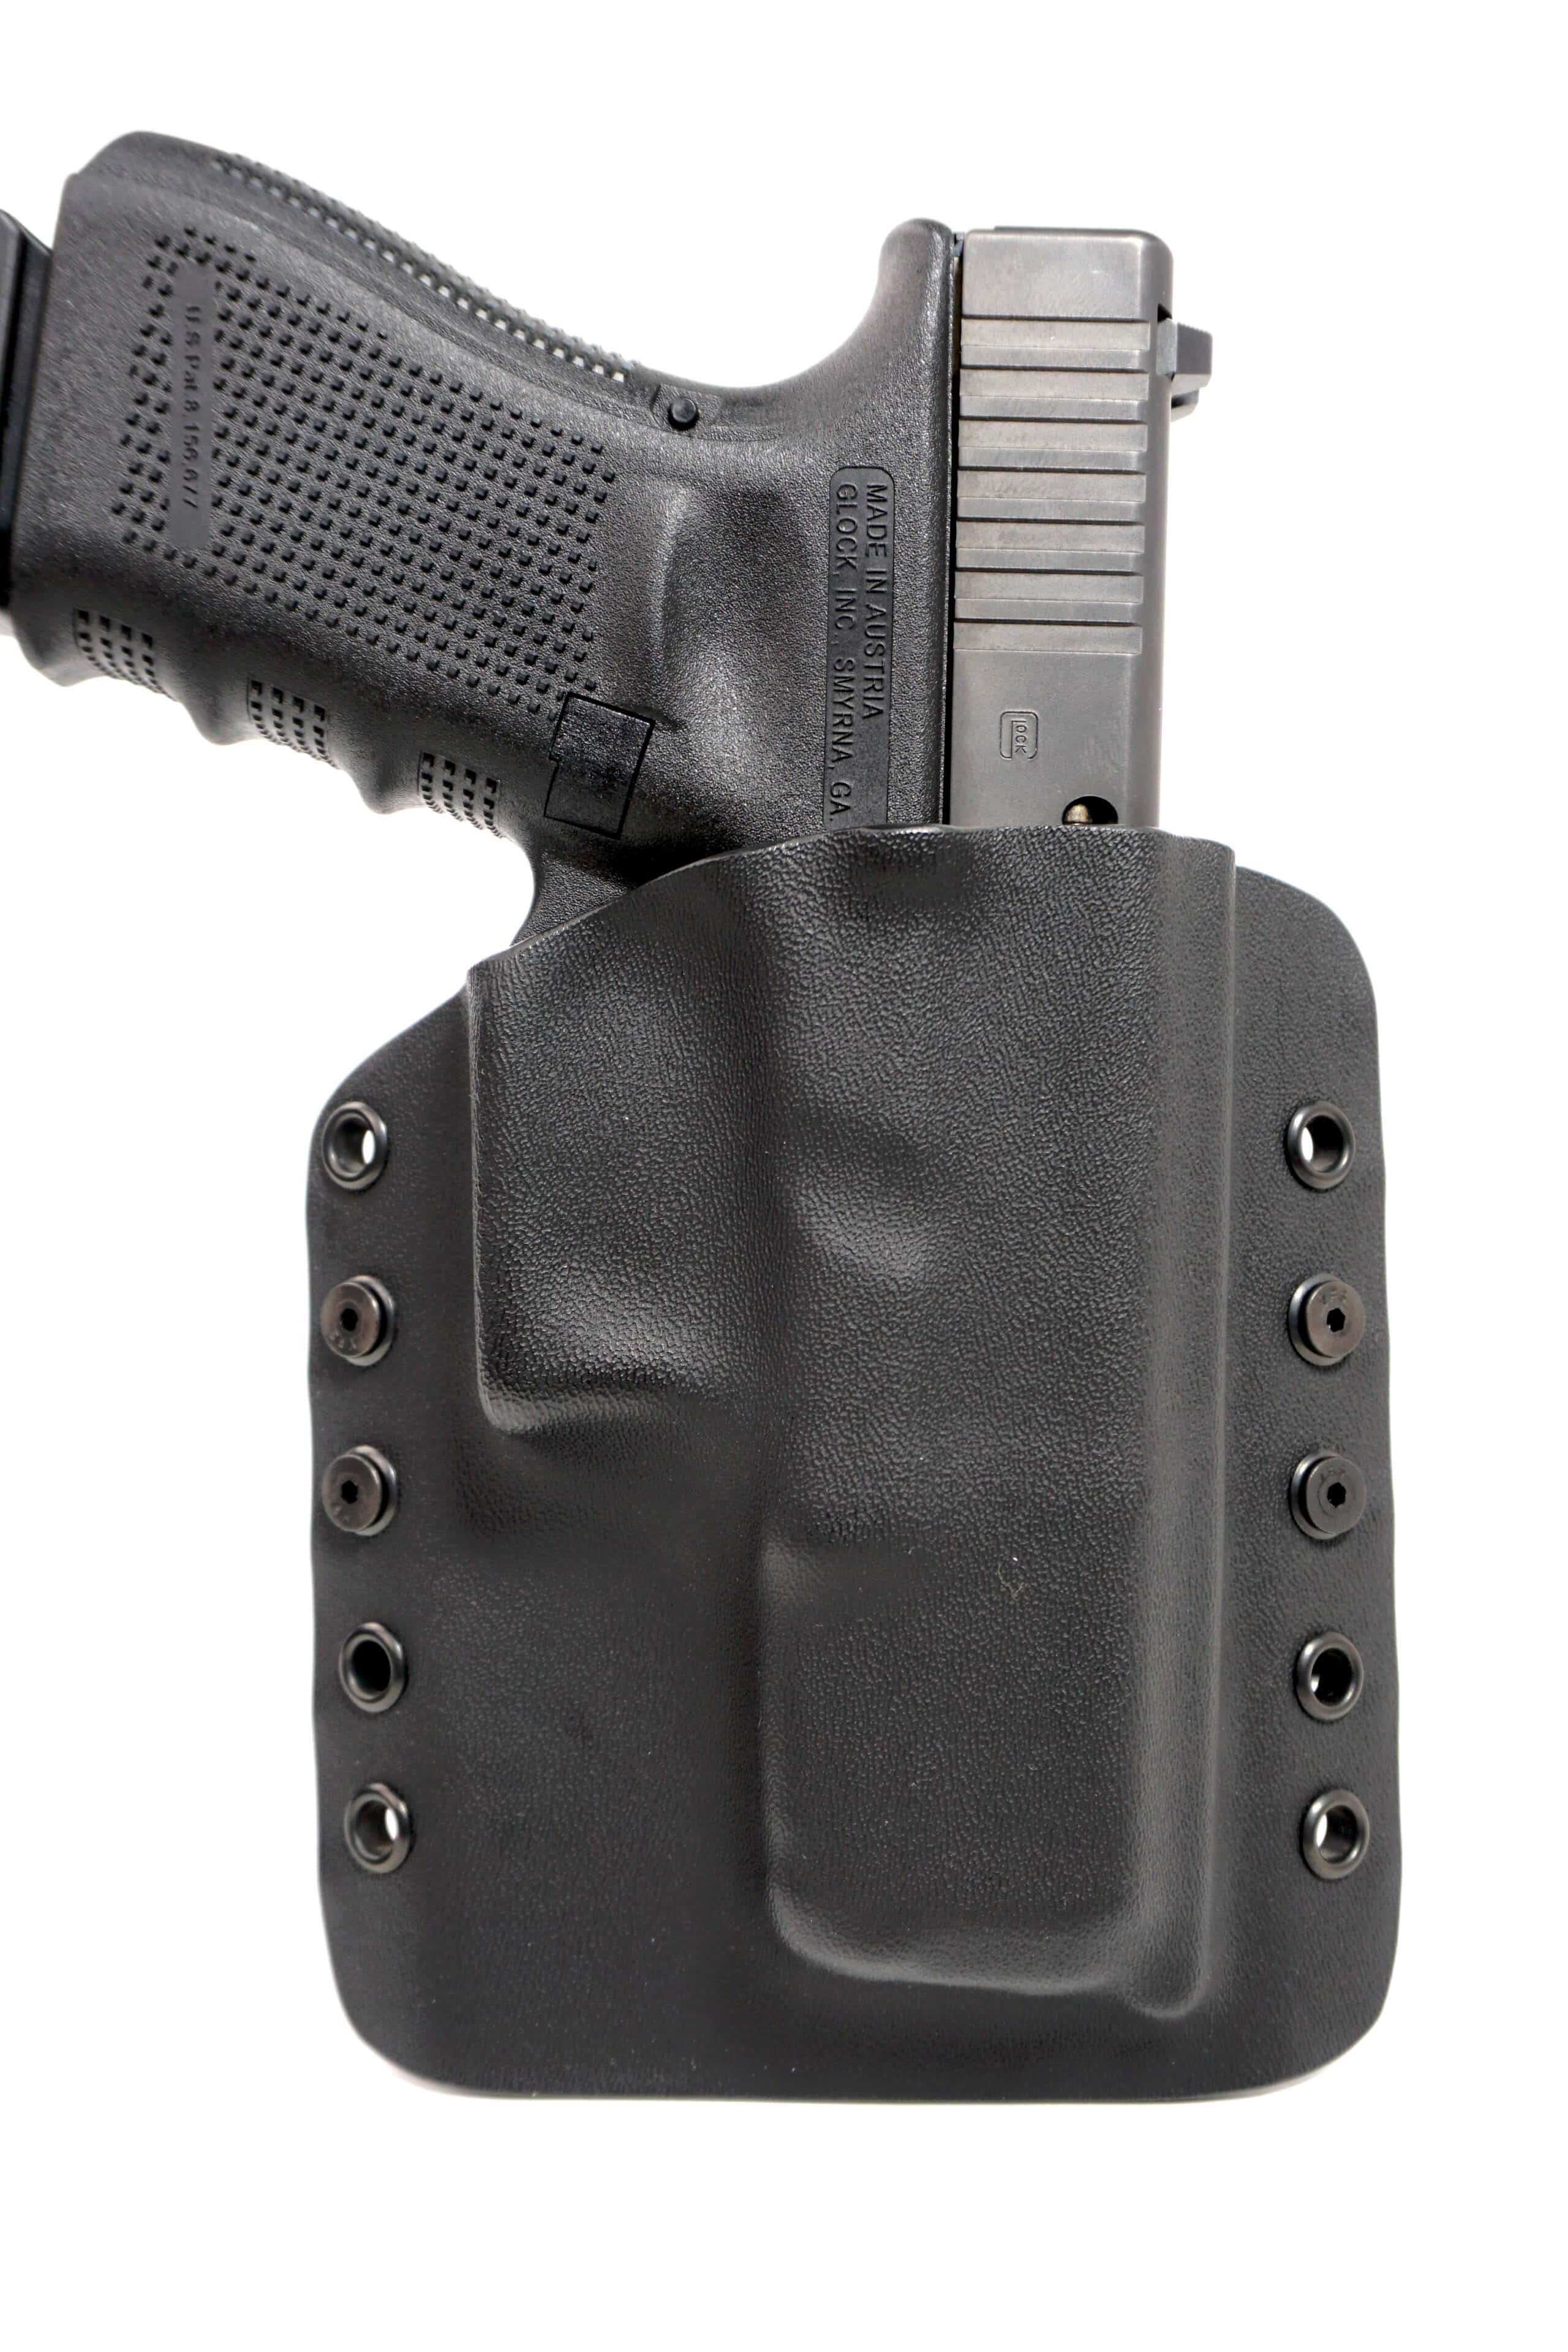 Leather Kydex Paddle Gun Holster LH RH For FN 509